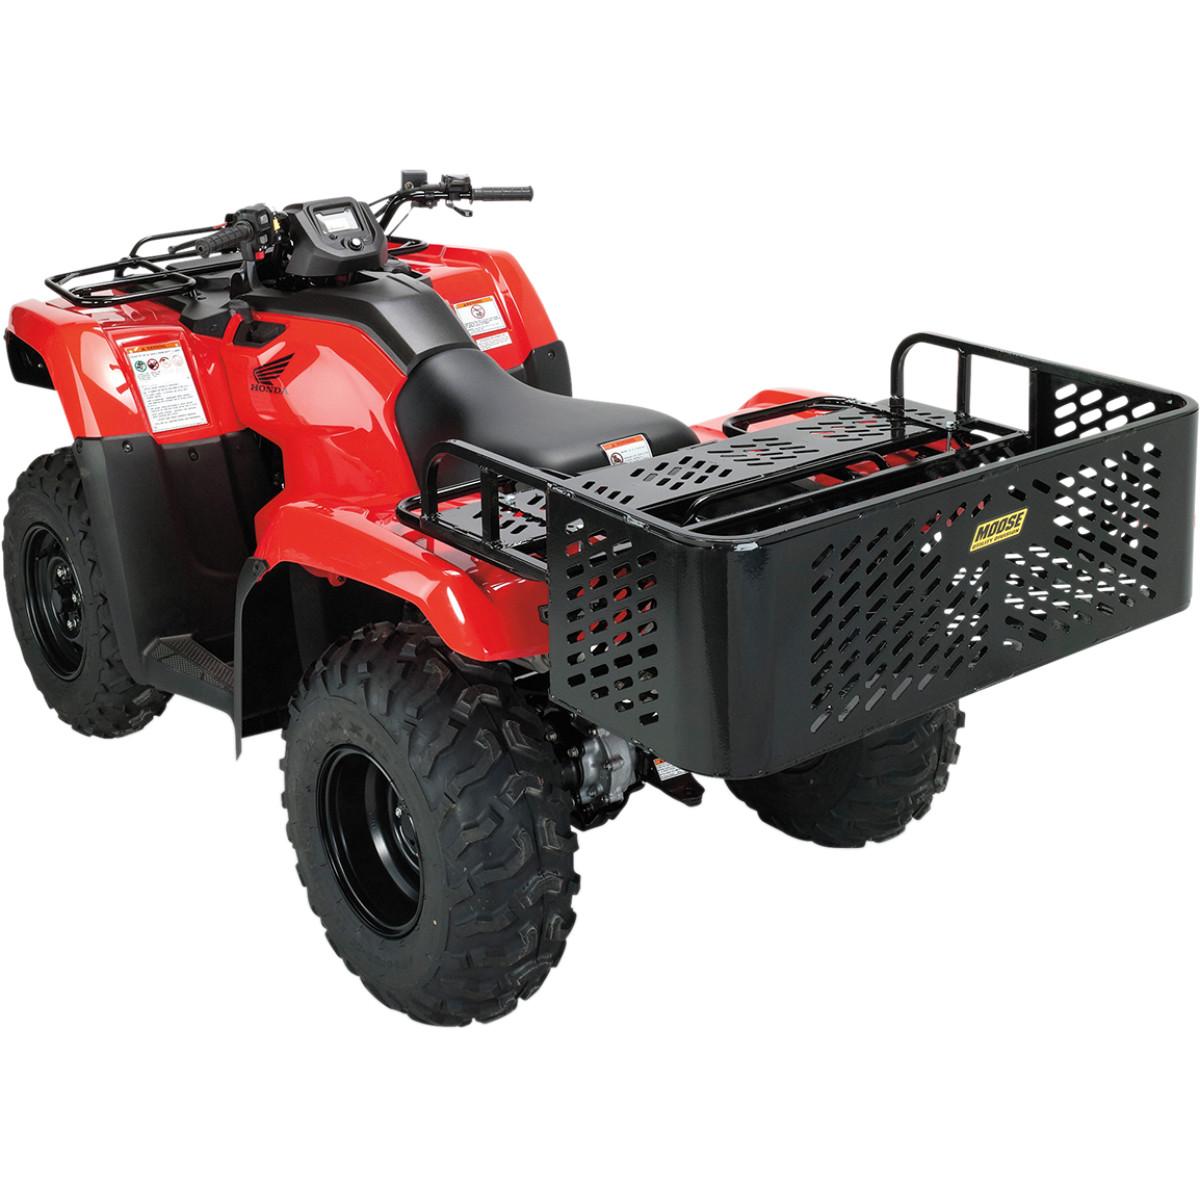 DROP RACK ATV MOOSE